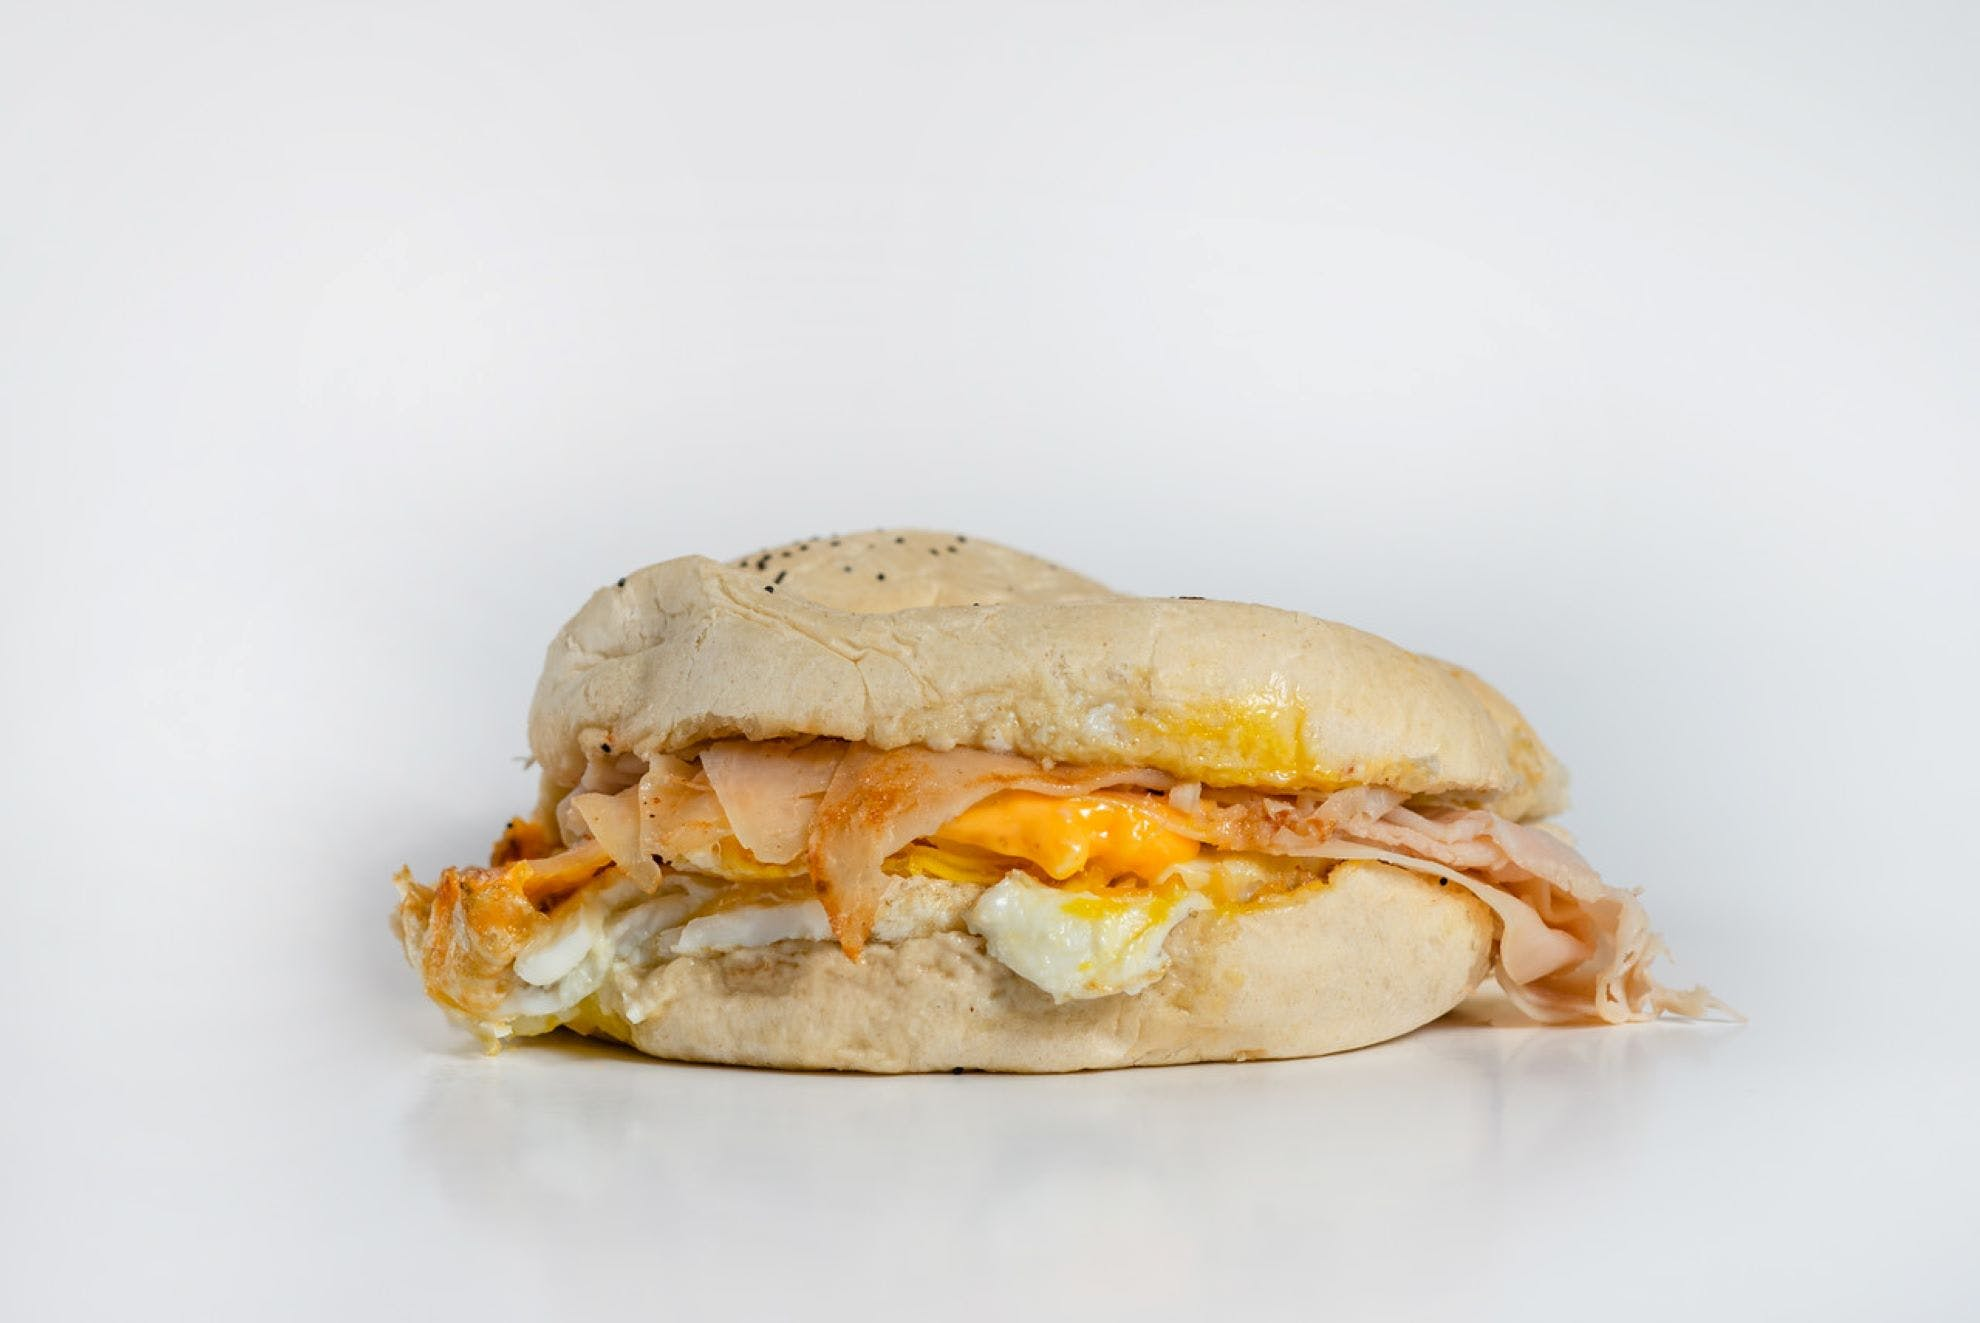 Manorville Breakfast Sandwich from Gandolfo's New York Deli - American Fork in American Fork, UT